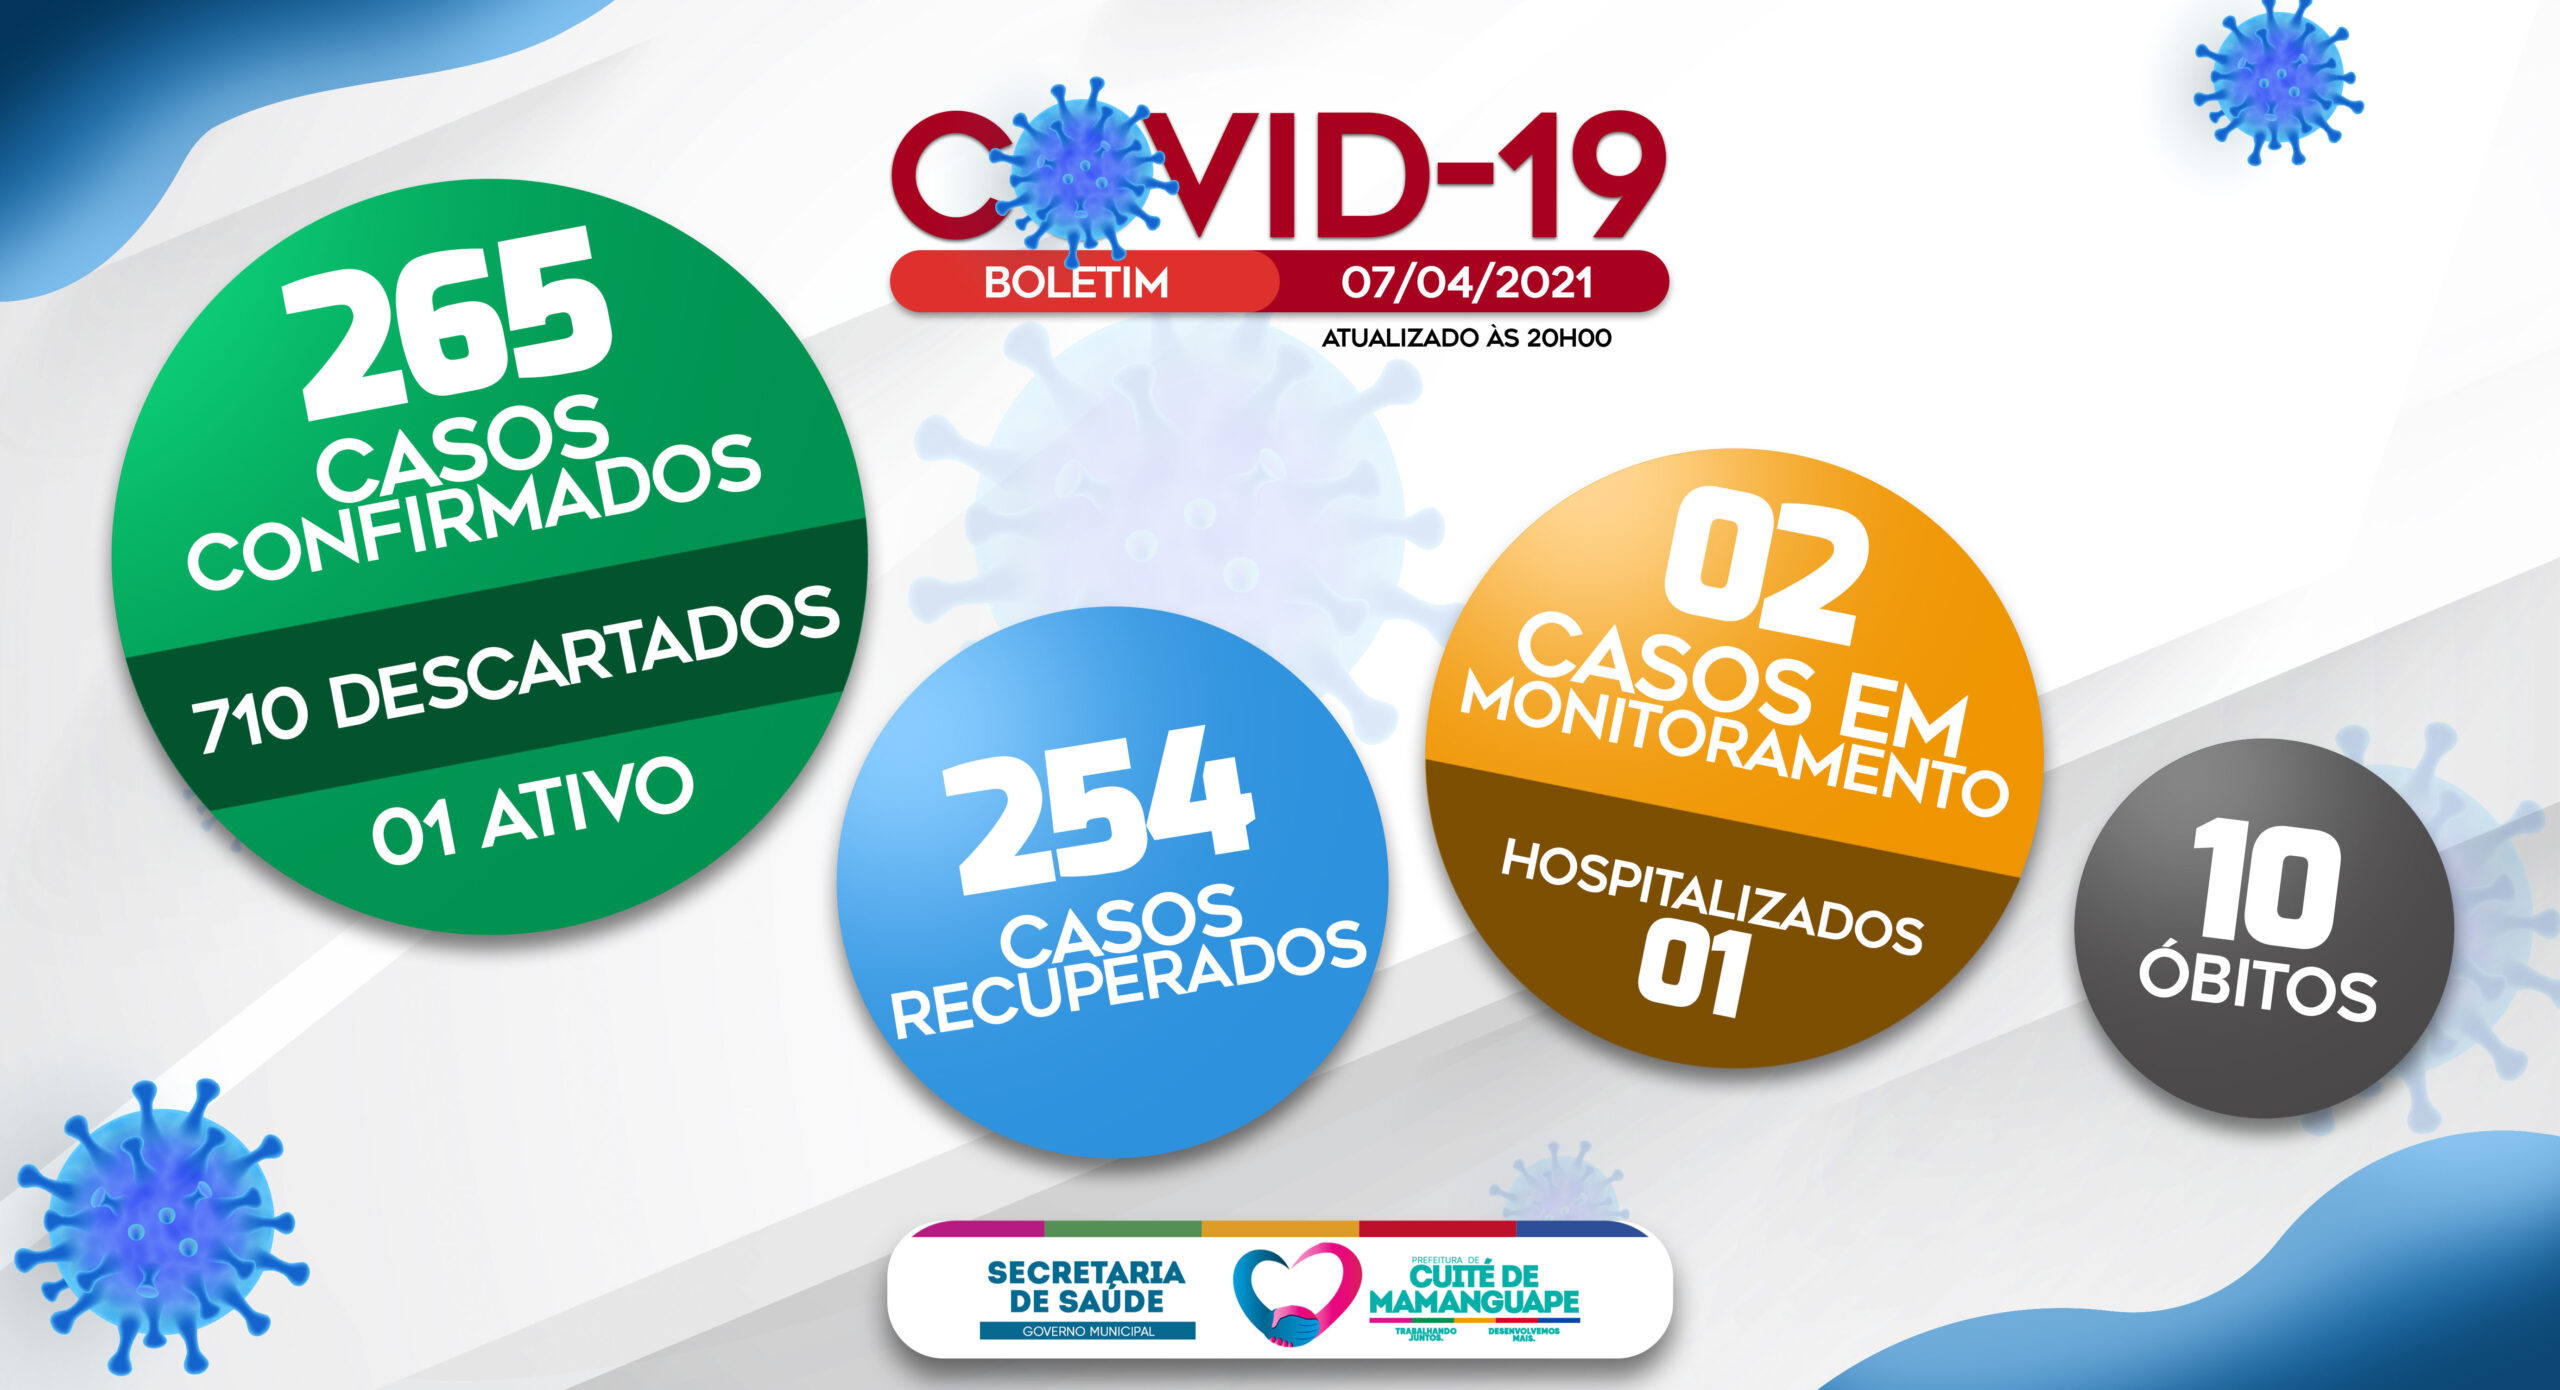 BOLETIM EPIDEMIOLÓGICO COVID-19 (07/04/2021)